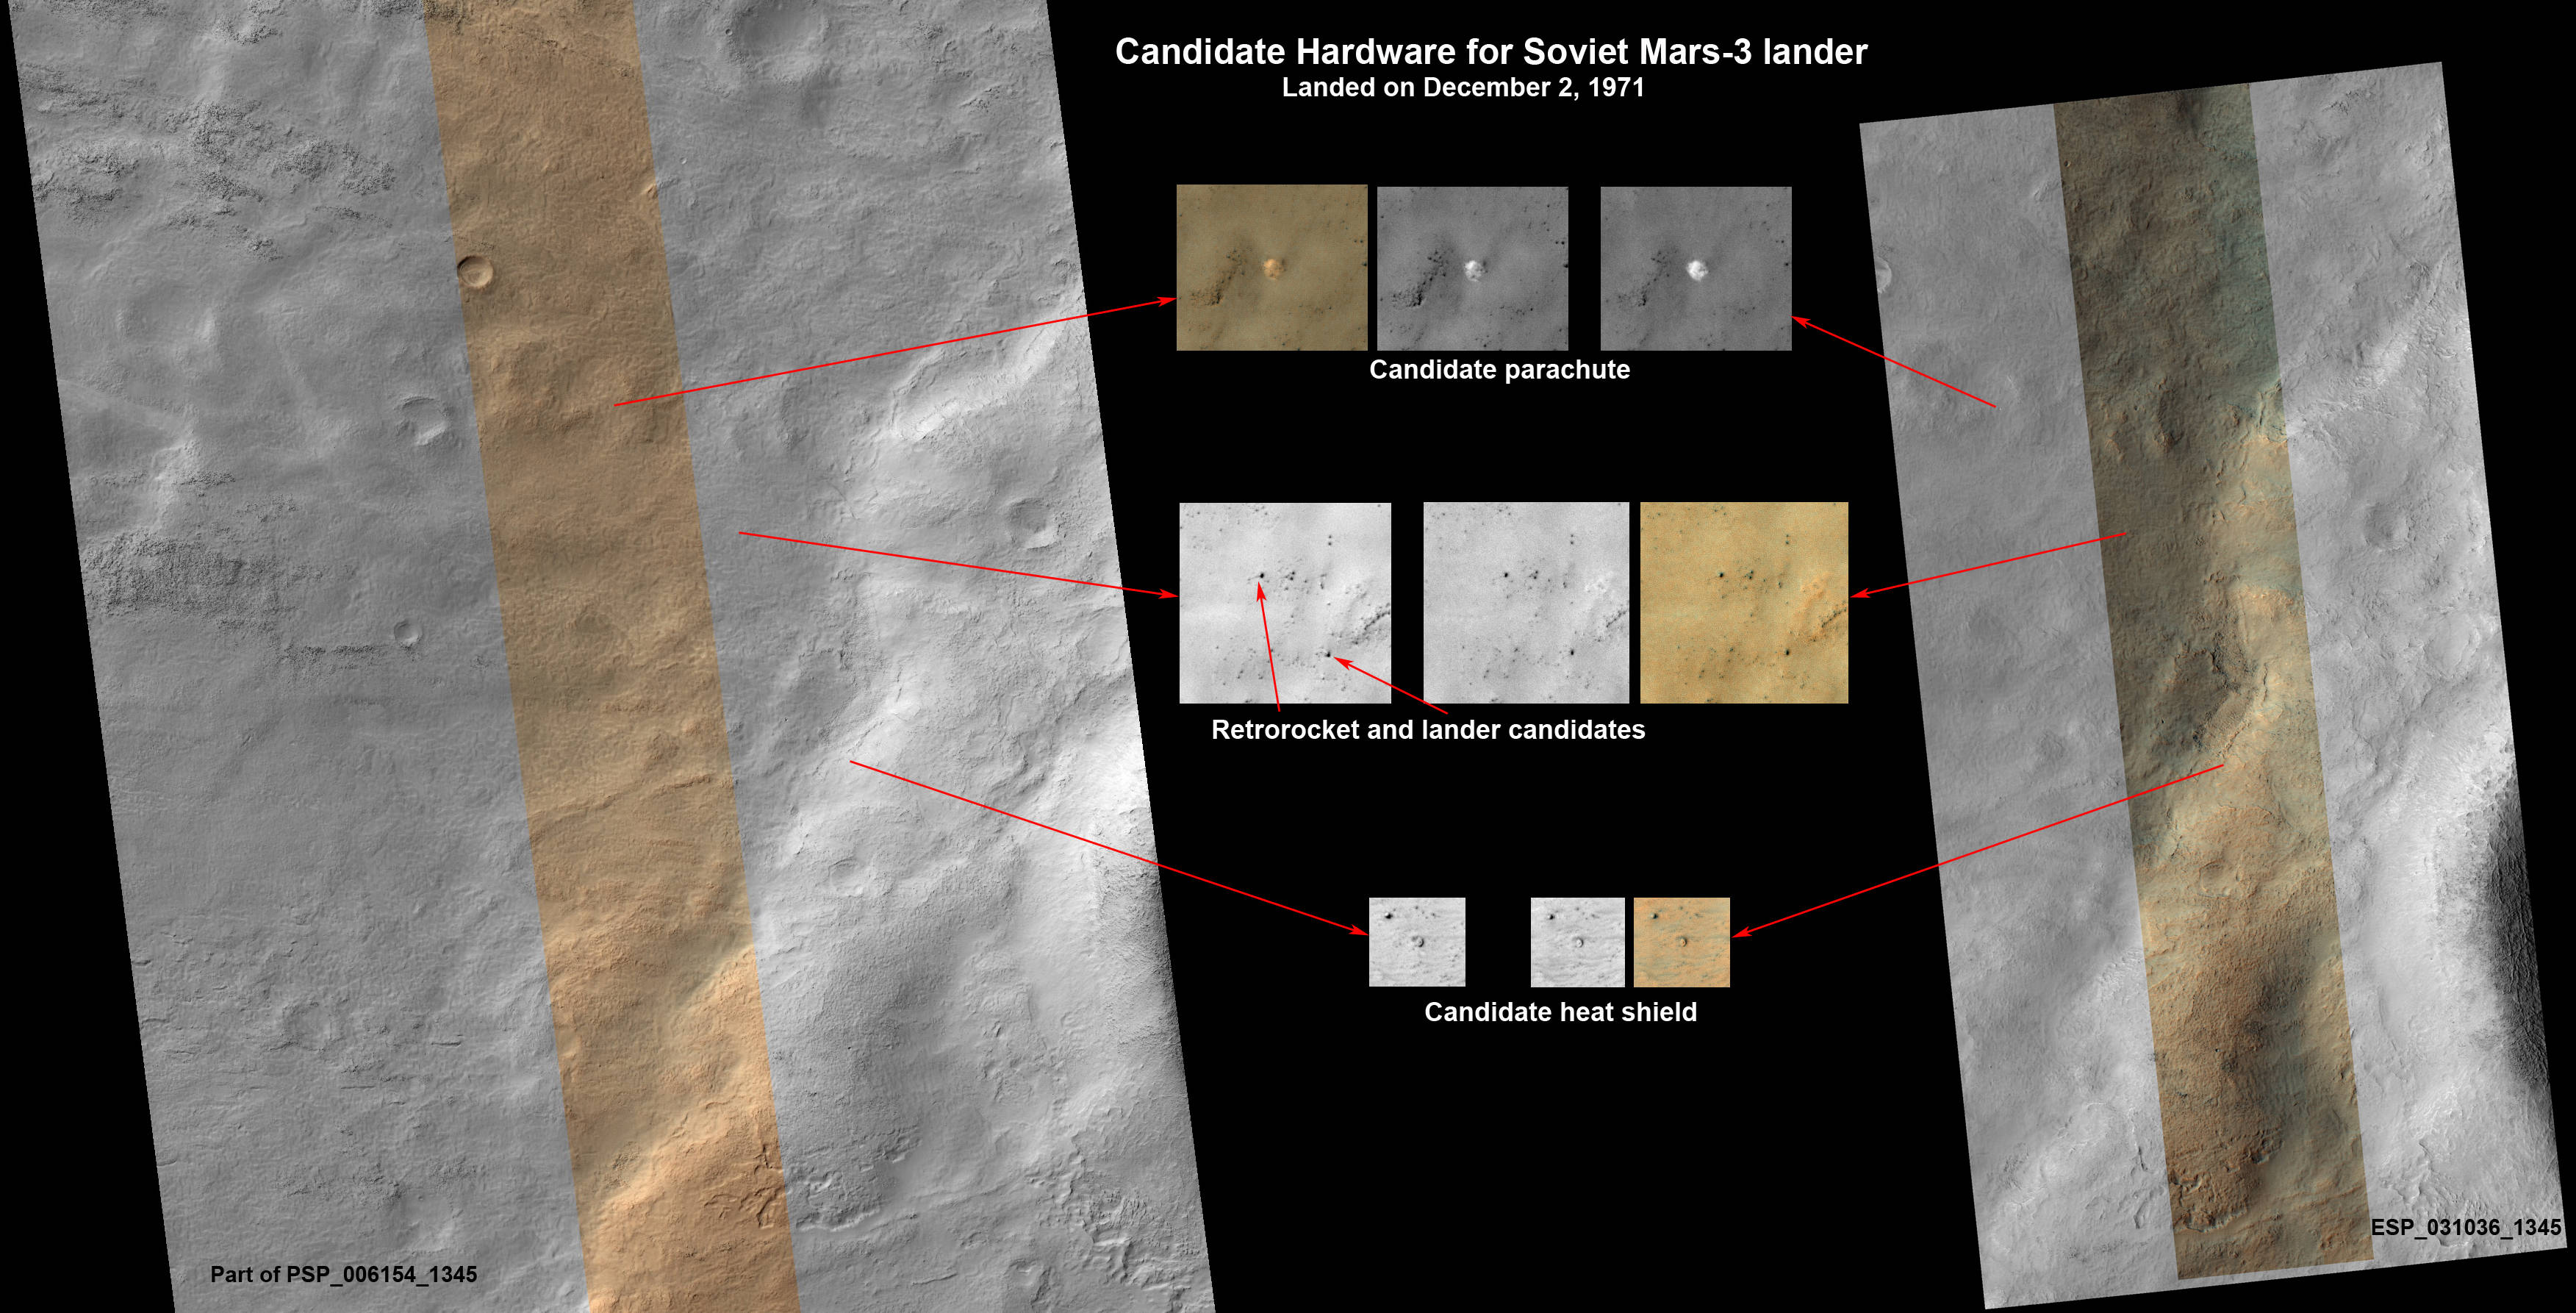 MRO image of Mars 3